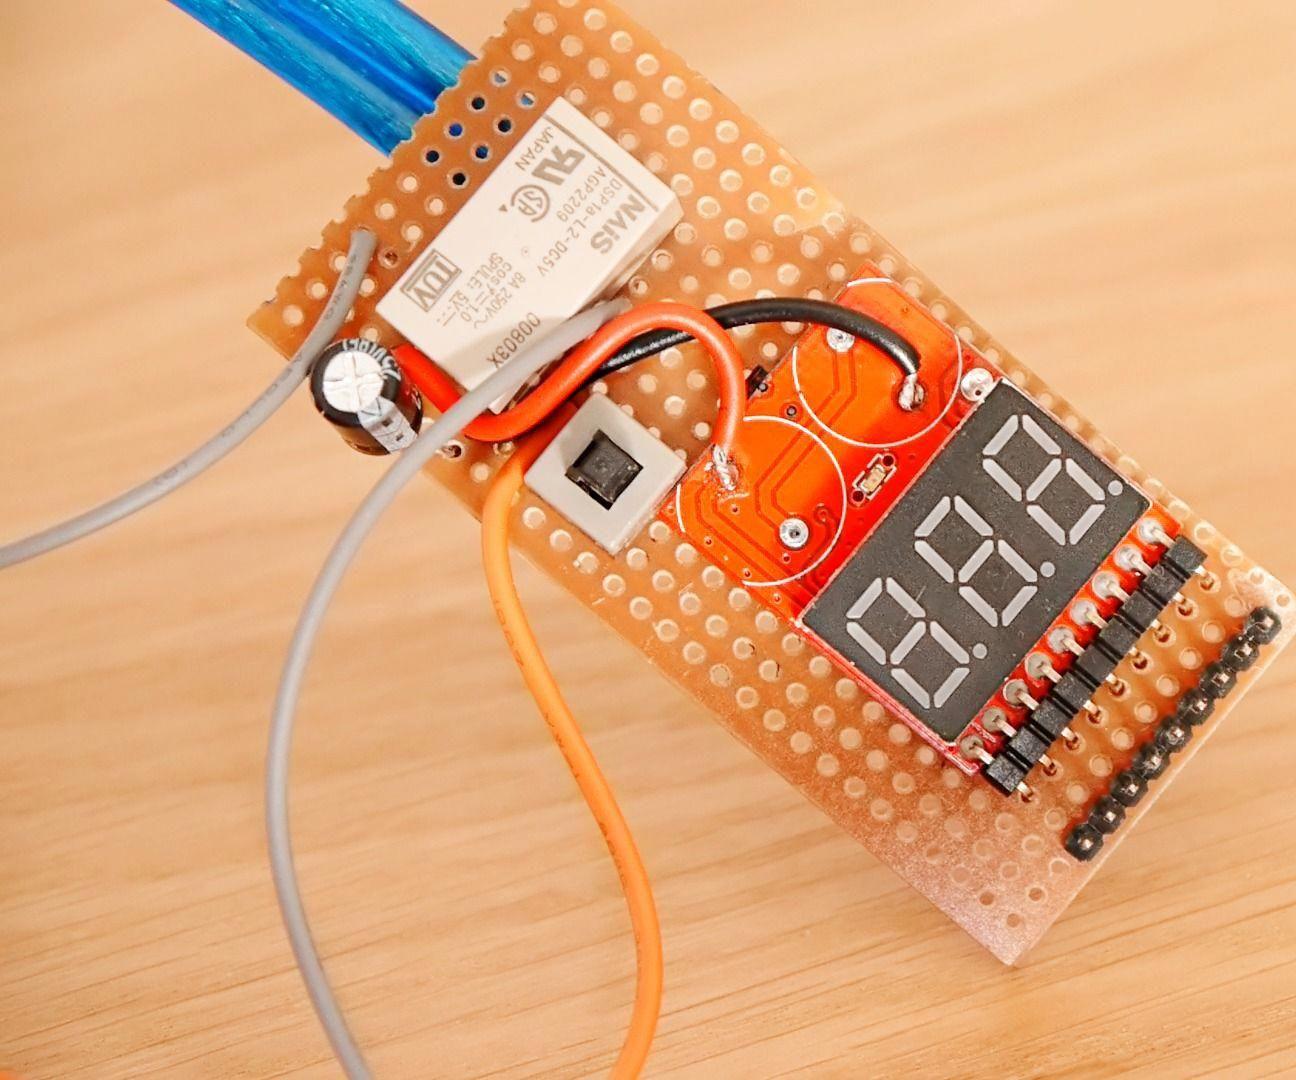 Pin on lithium battery diy